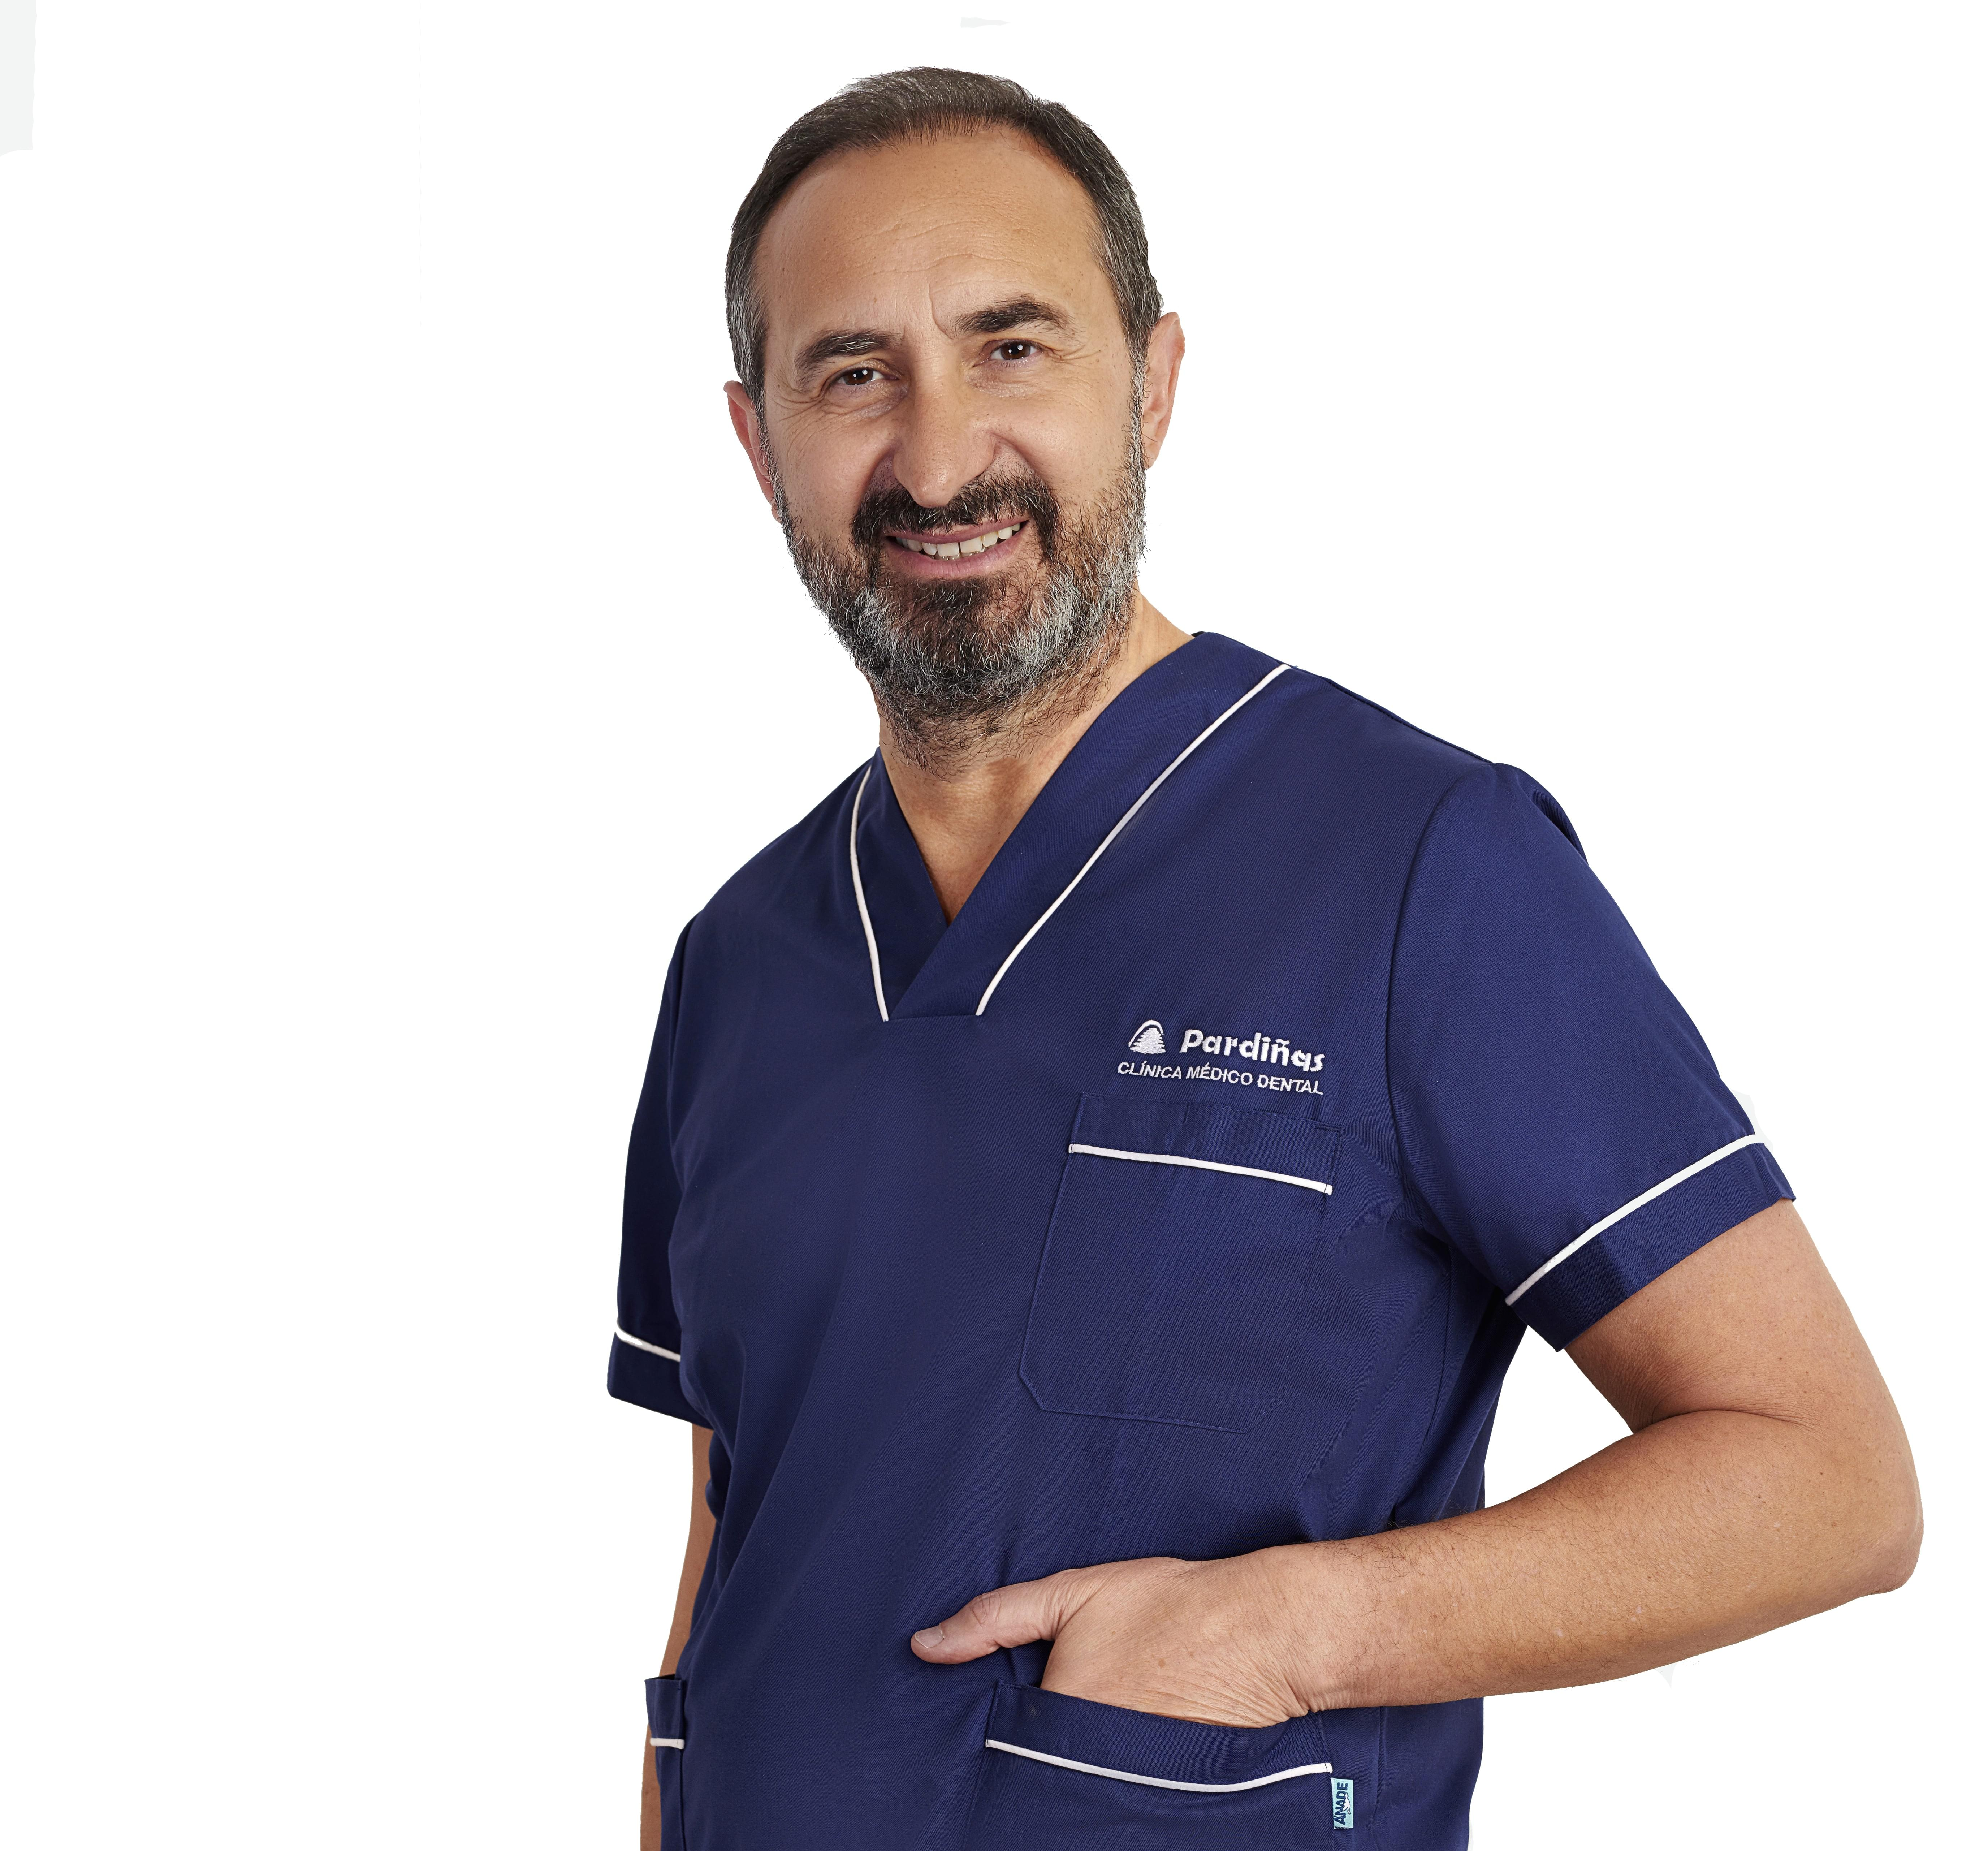 Dr. José Pardiñas Arias: Medical Doctor